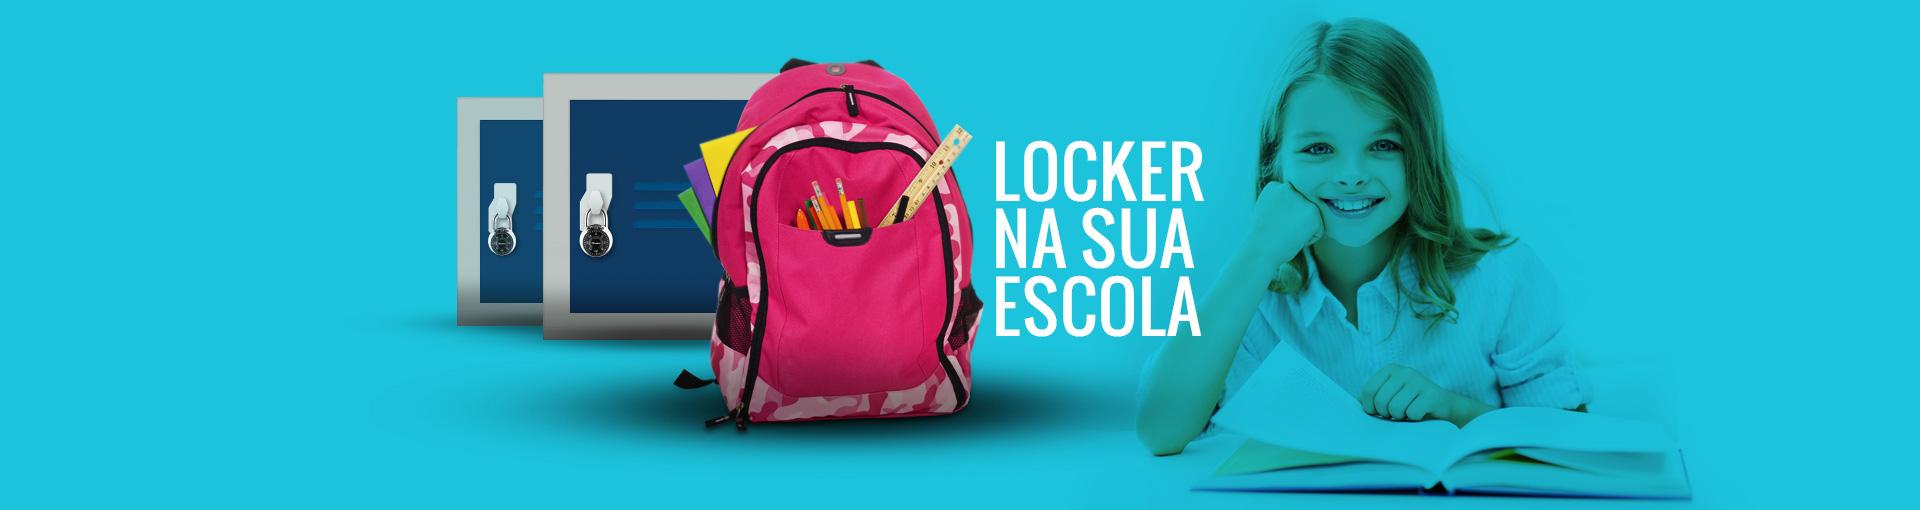 03-locker_banner_site_escola